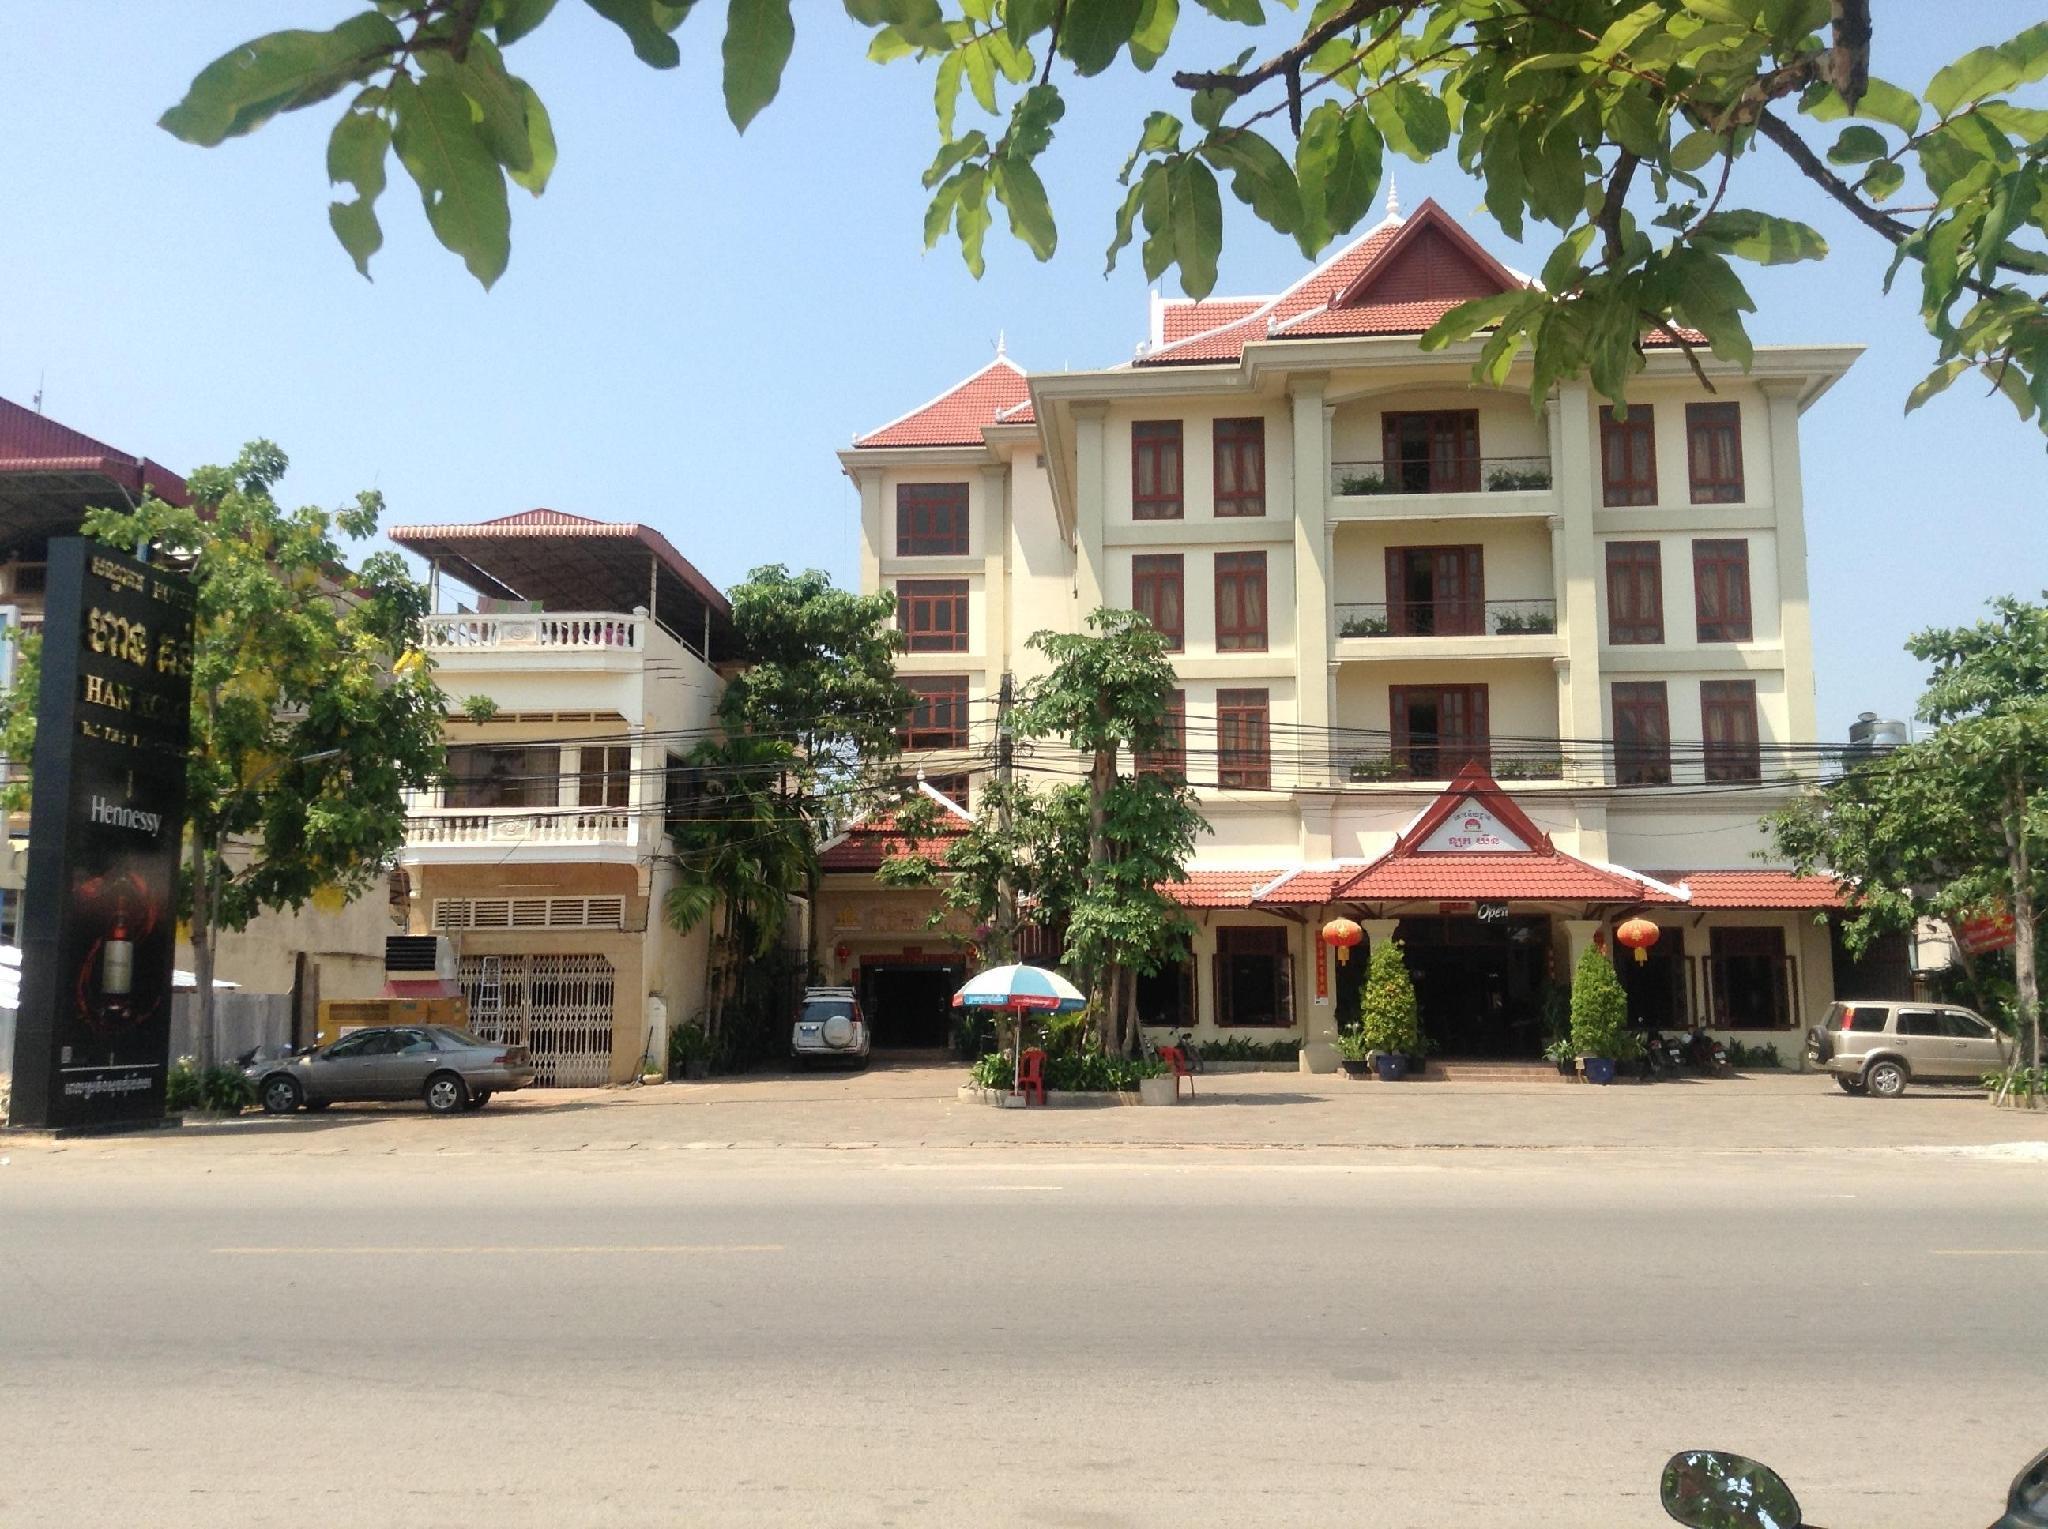 Han Kong Hotel